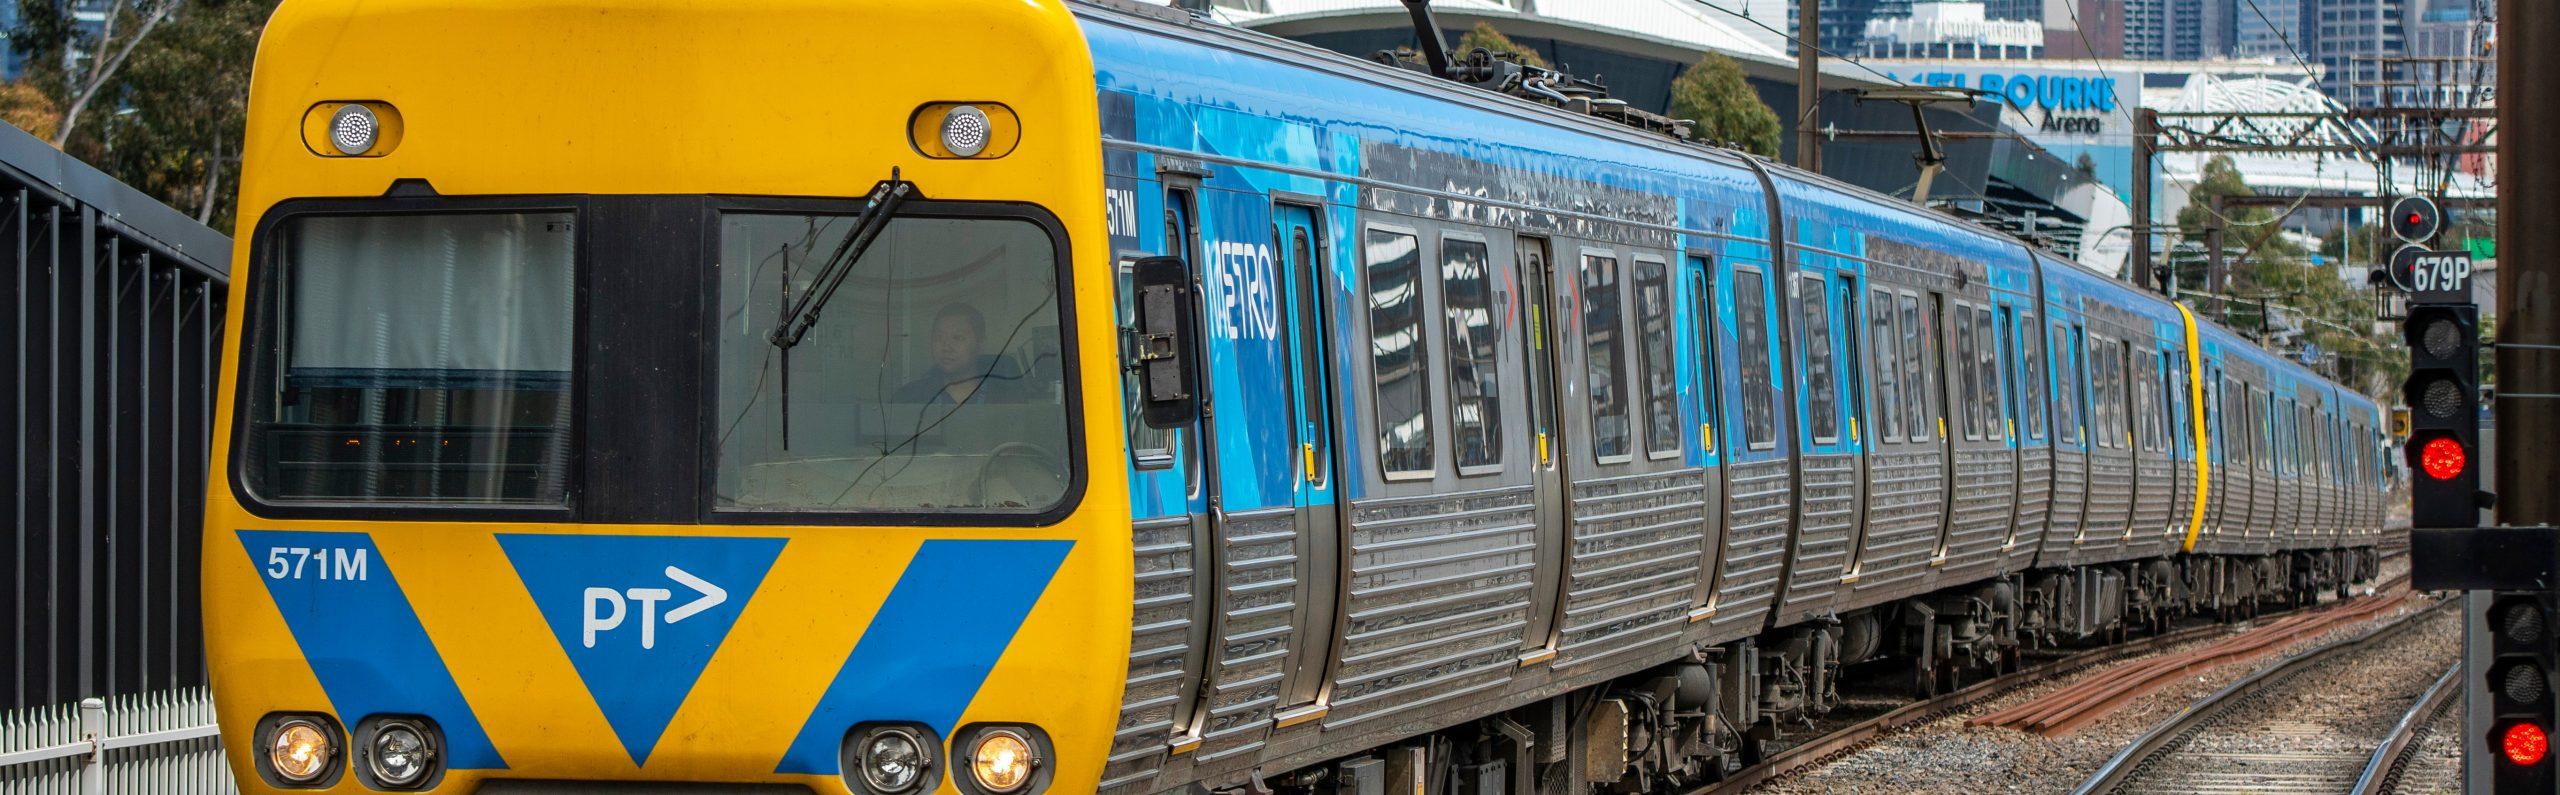 Wattly-comeng-train